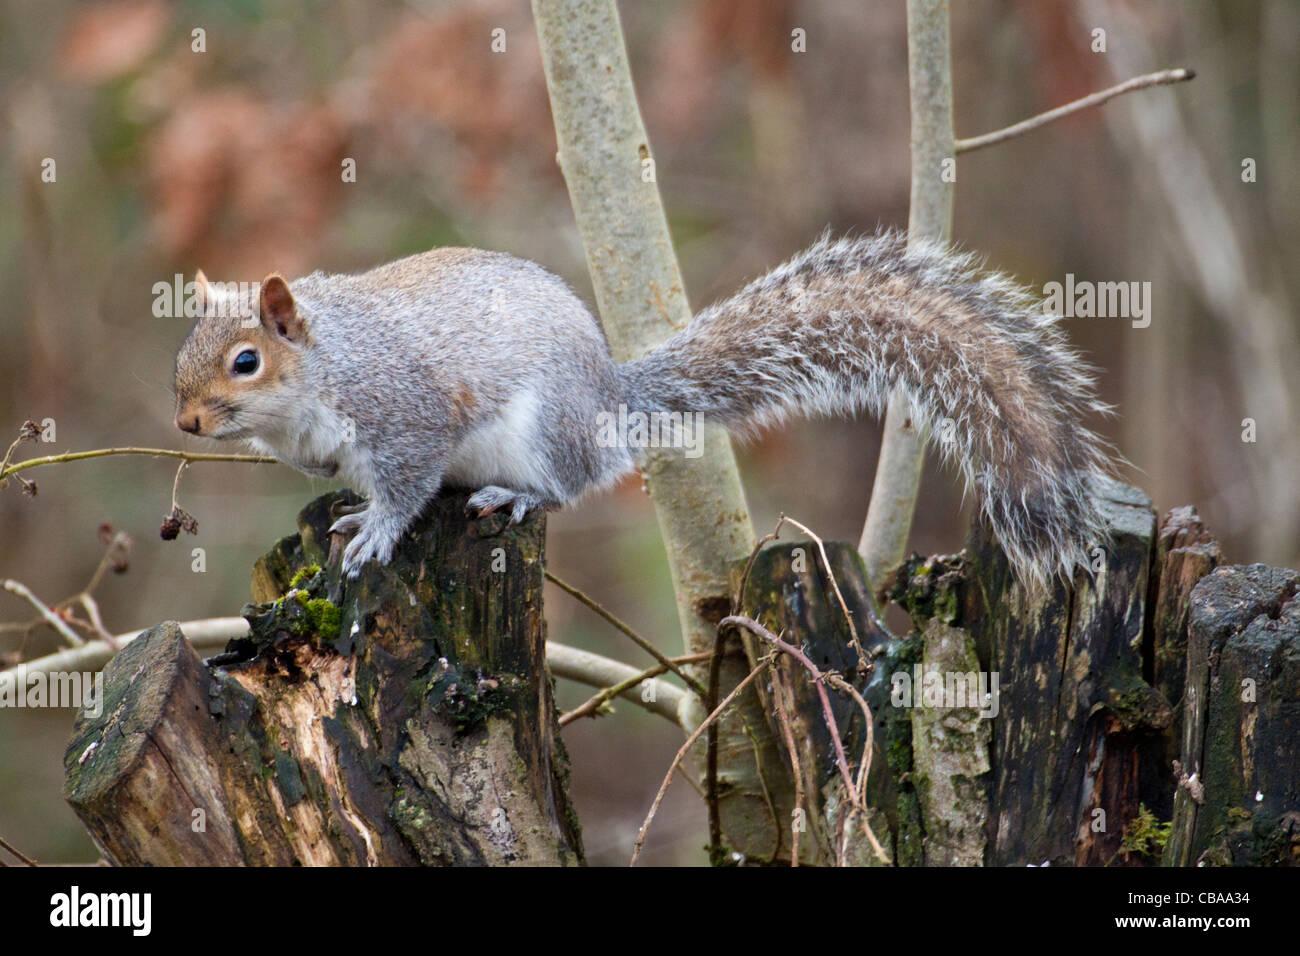 Grey squirrel in Autumn woodland - Stock Image